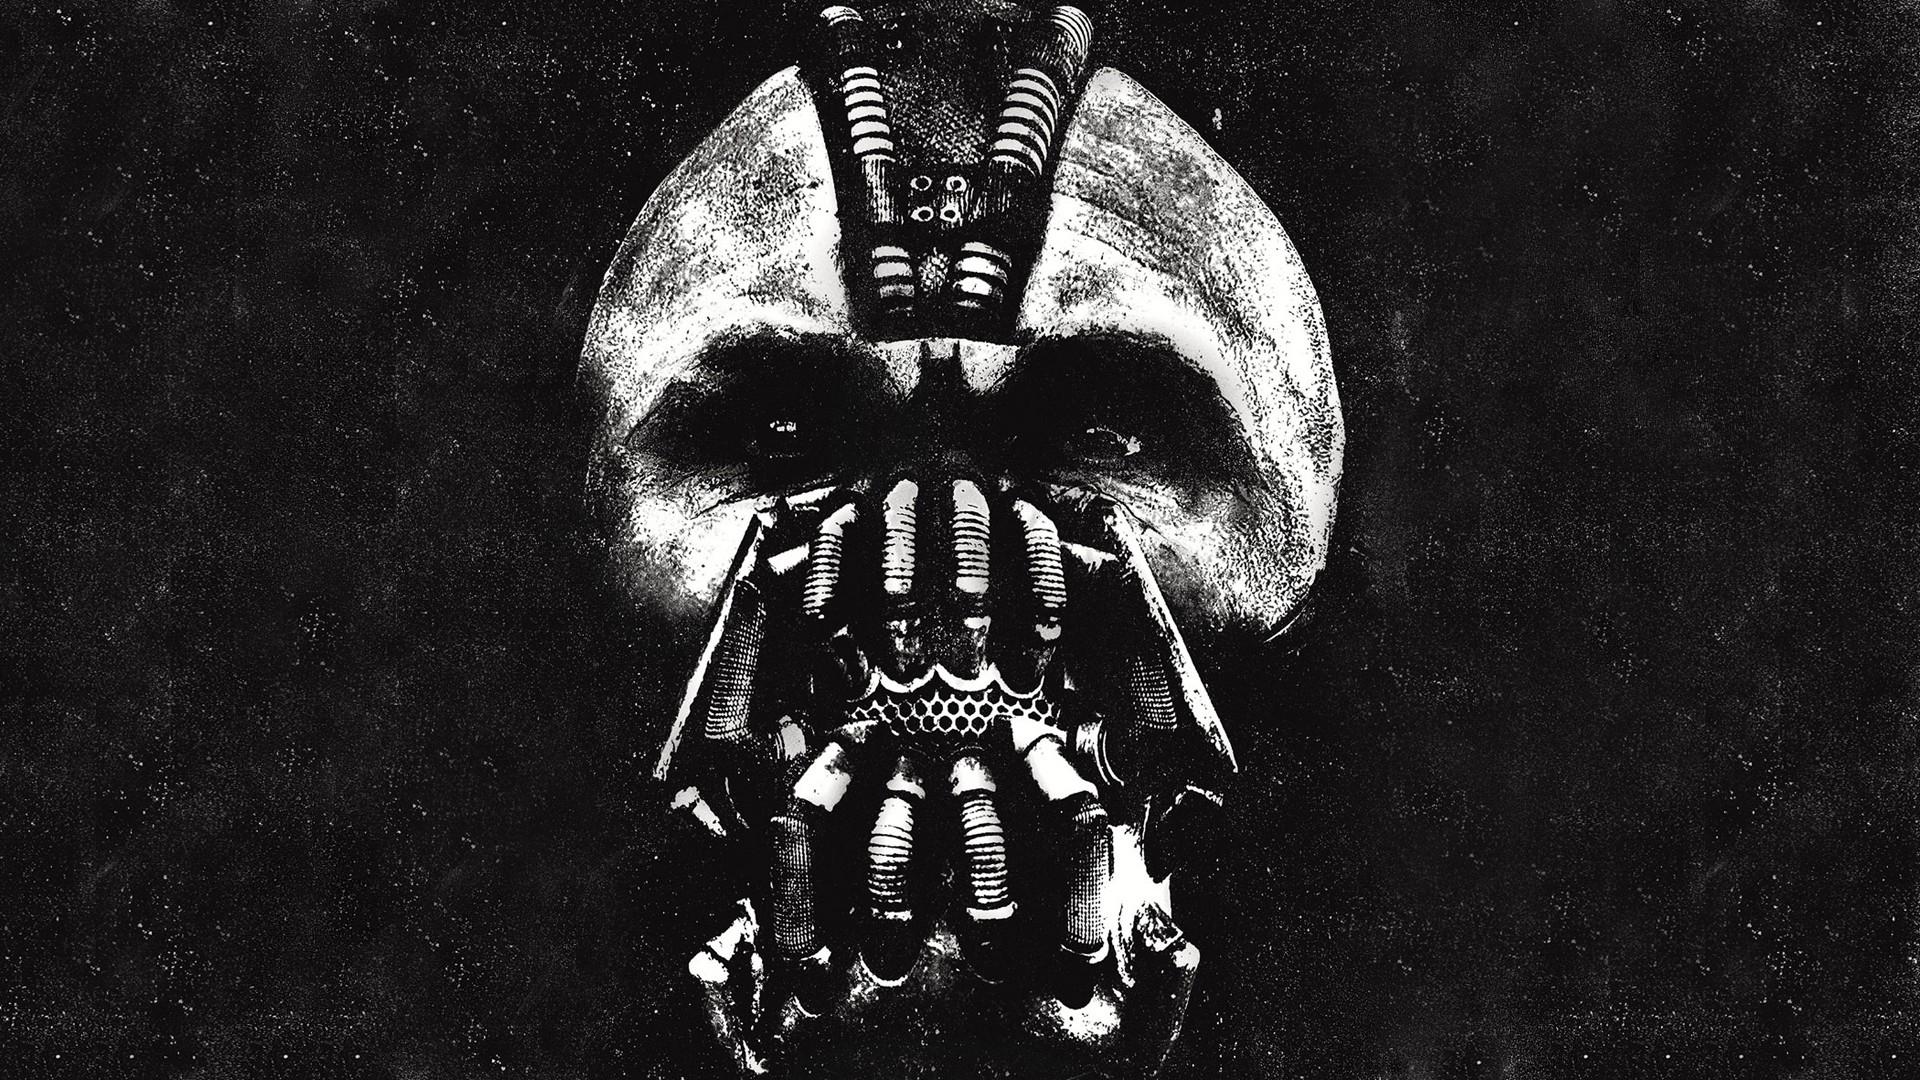 The dark knight rises bane batman comics movies games mask ...